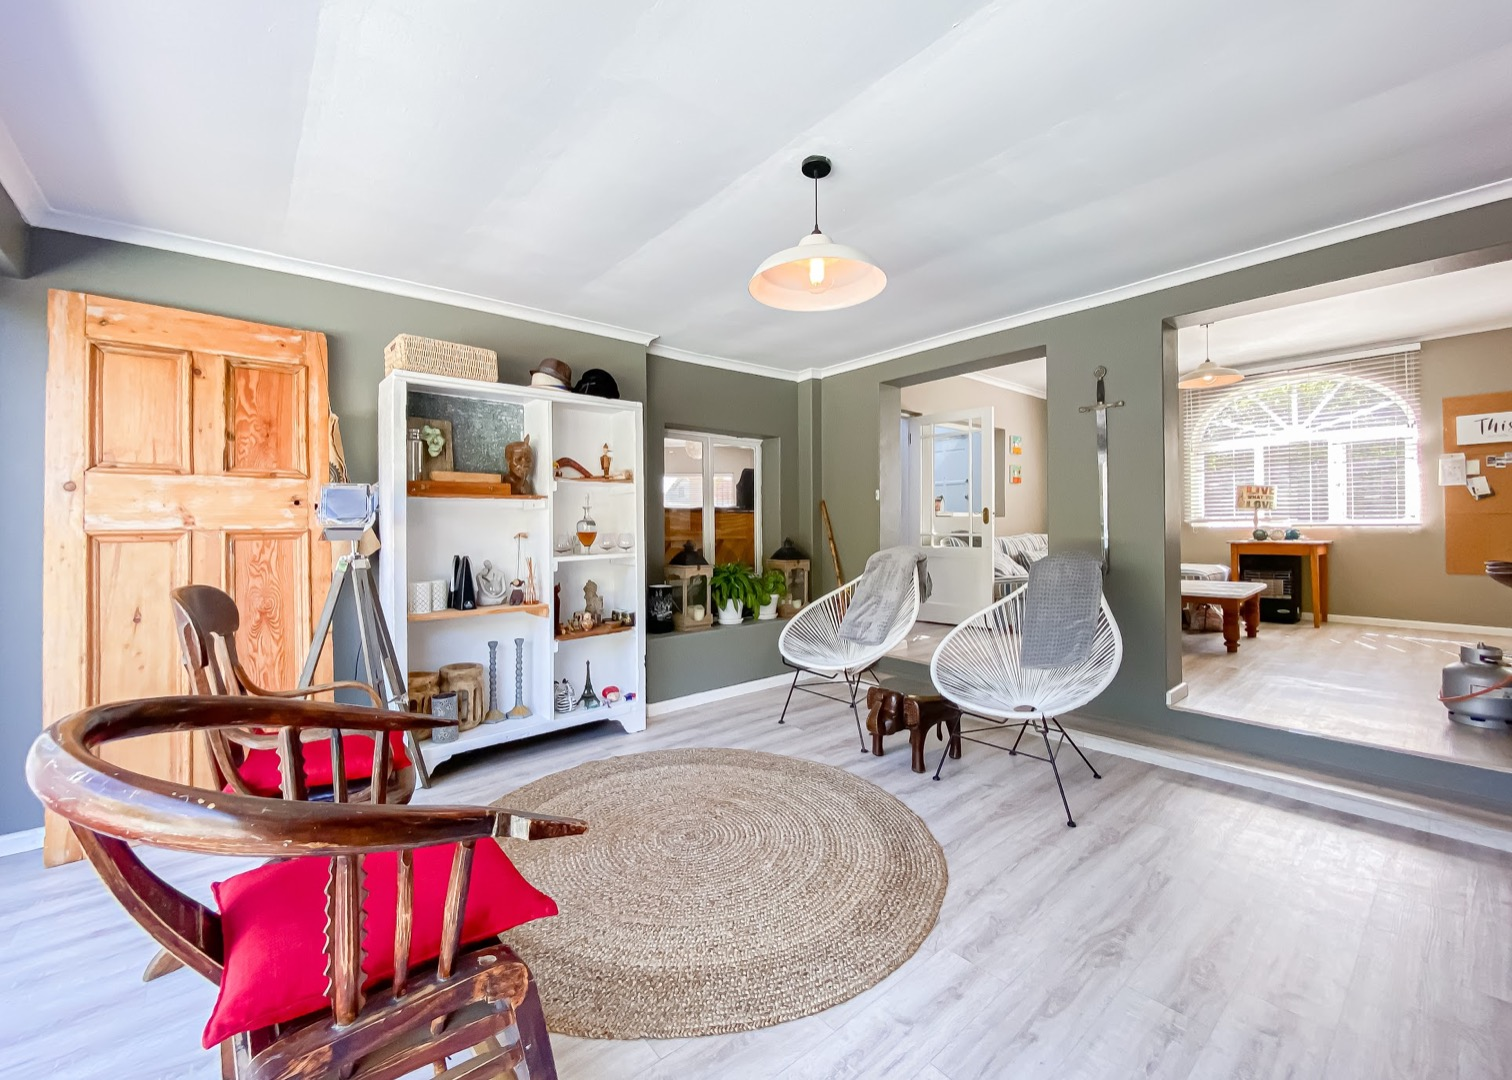 4 Bedroom House For Sale in Melkbosstrand Central